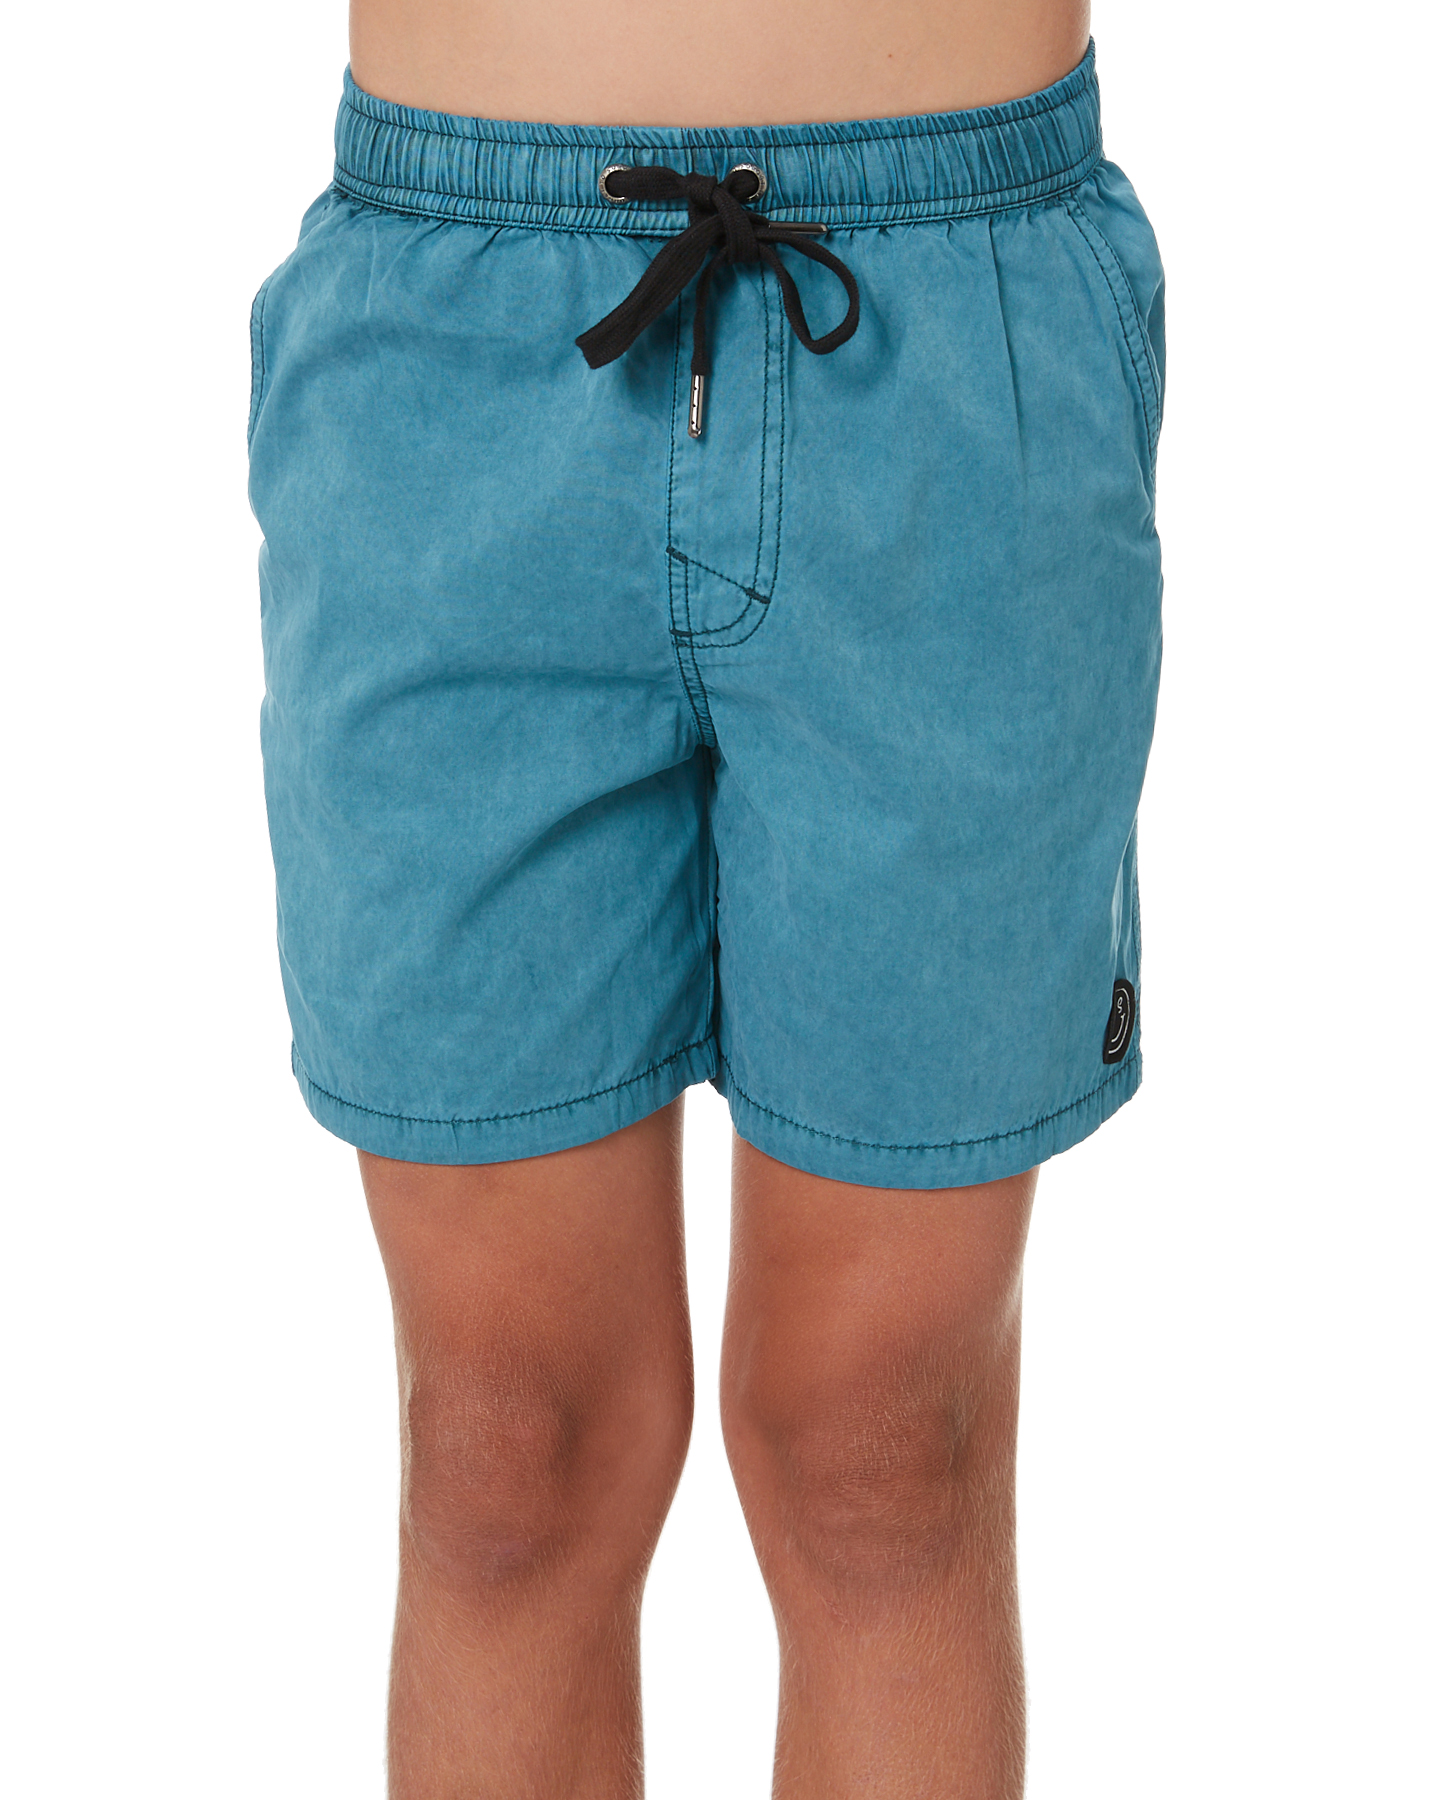 Stay Boys T.O.S. Beachshort - Teens Pigment Jade Pigment Jade